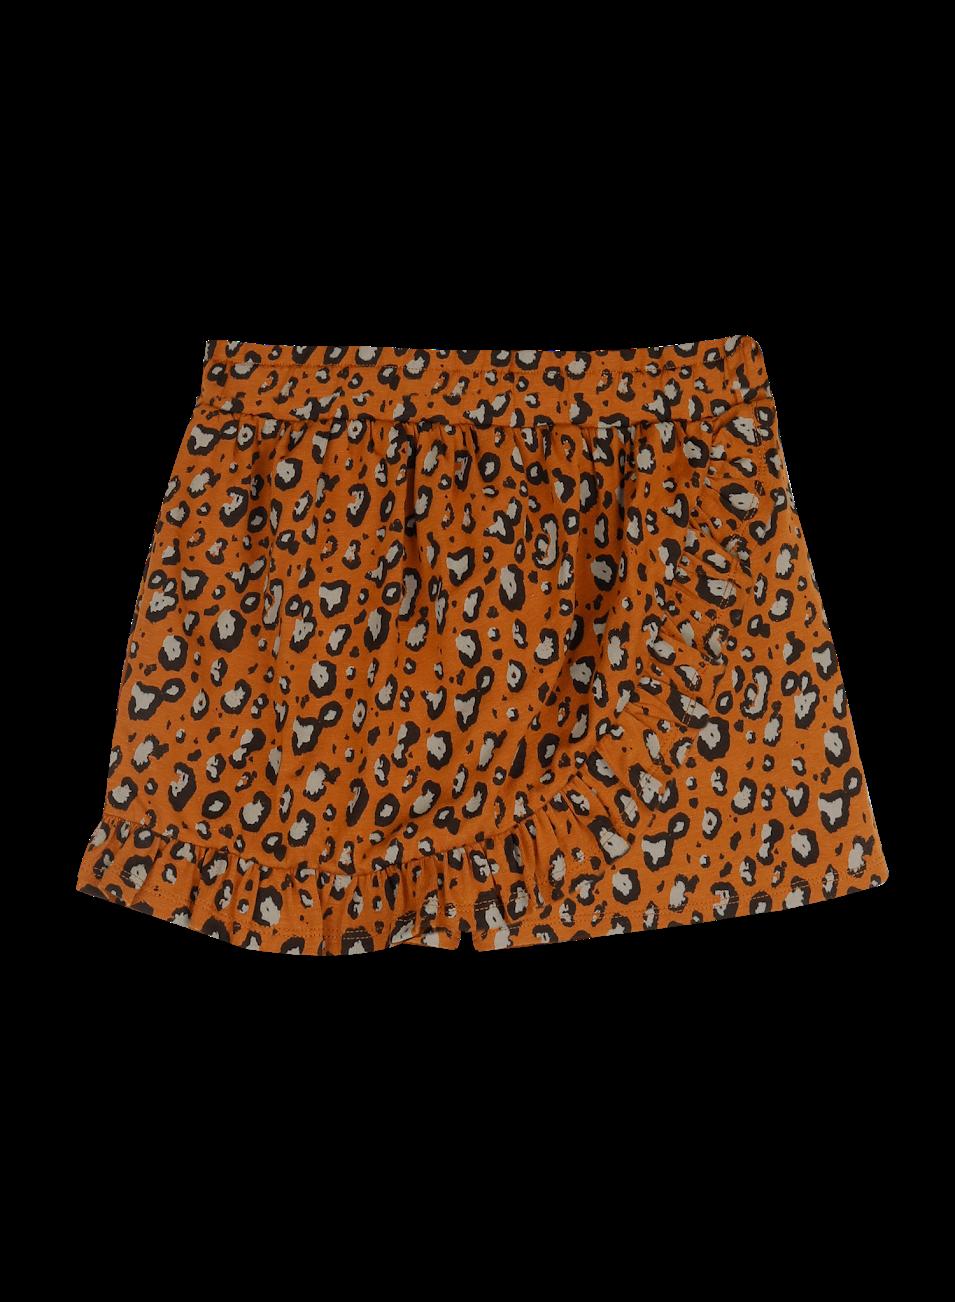 Ammehoela Ammehoela - Bella.01 leopard